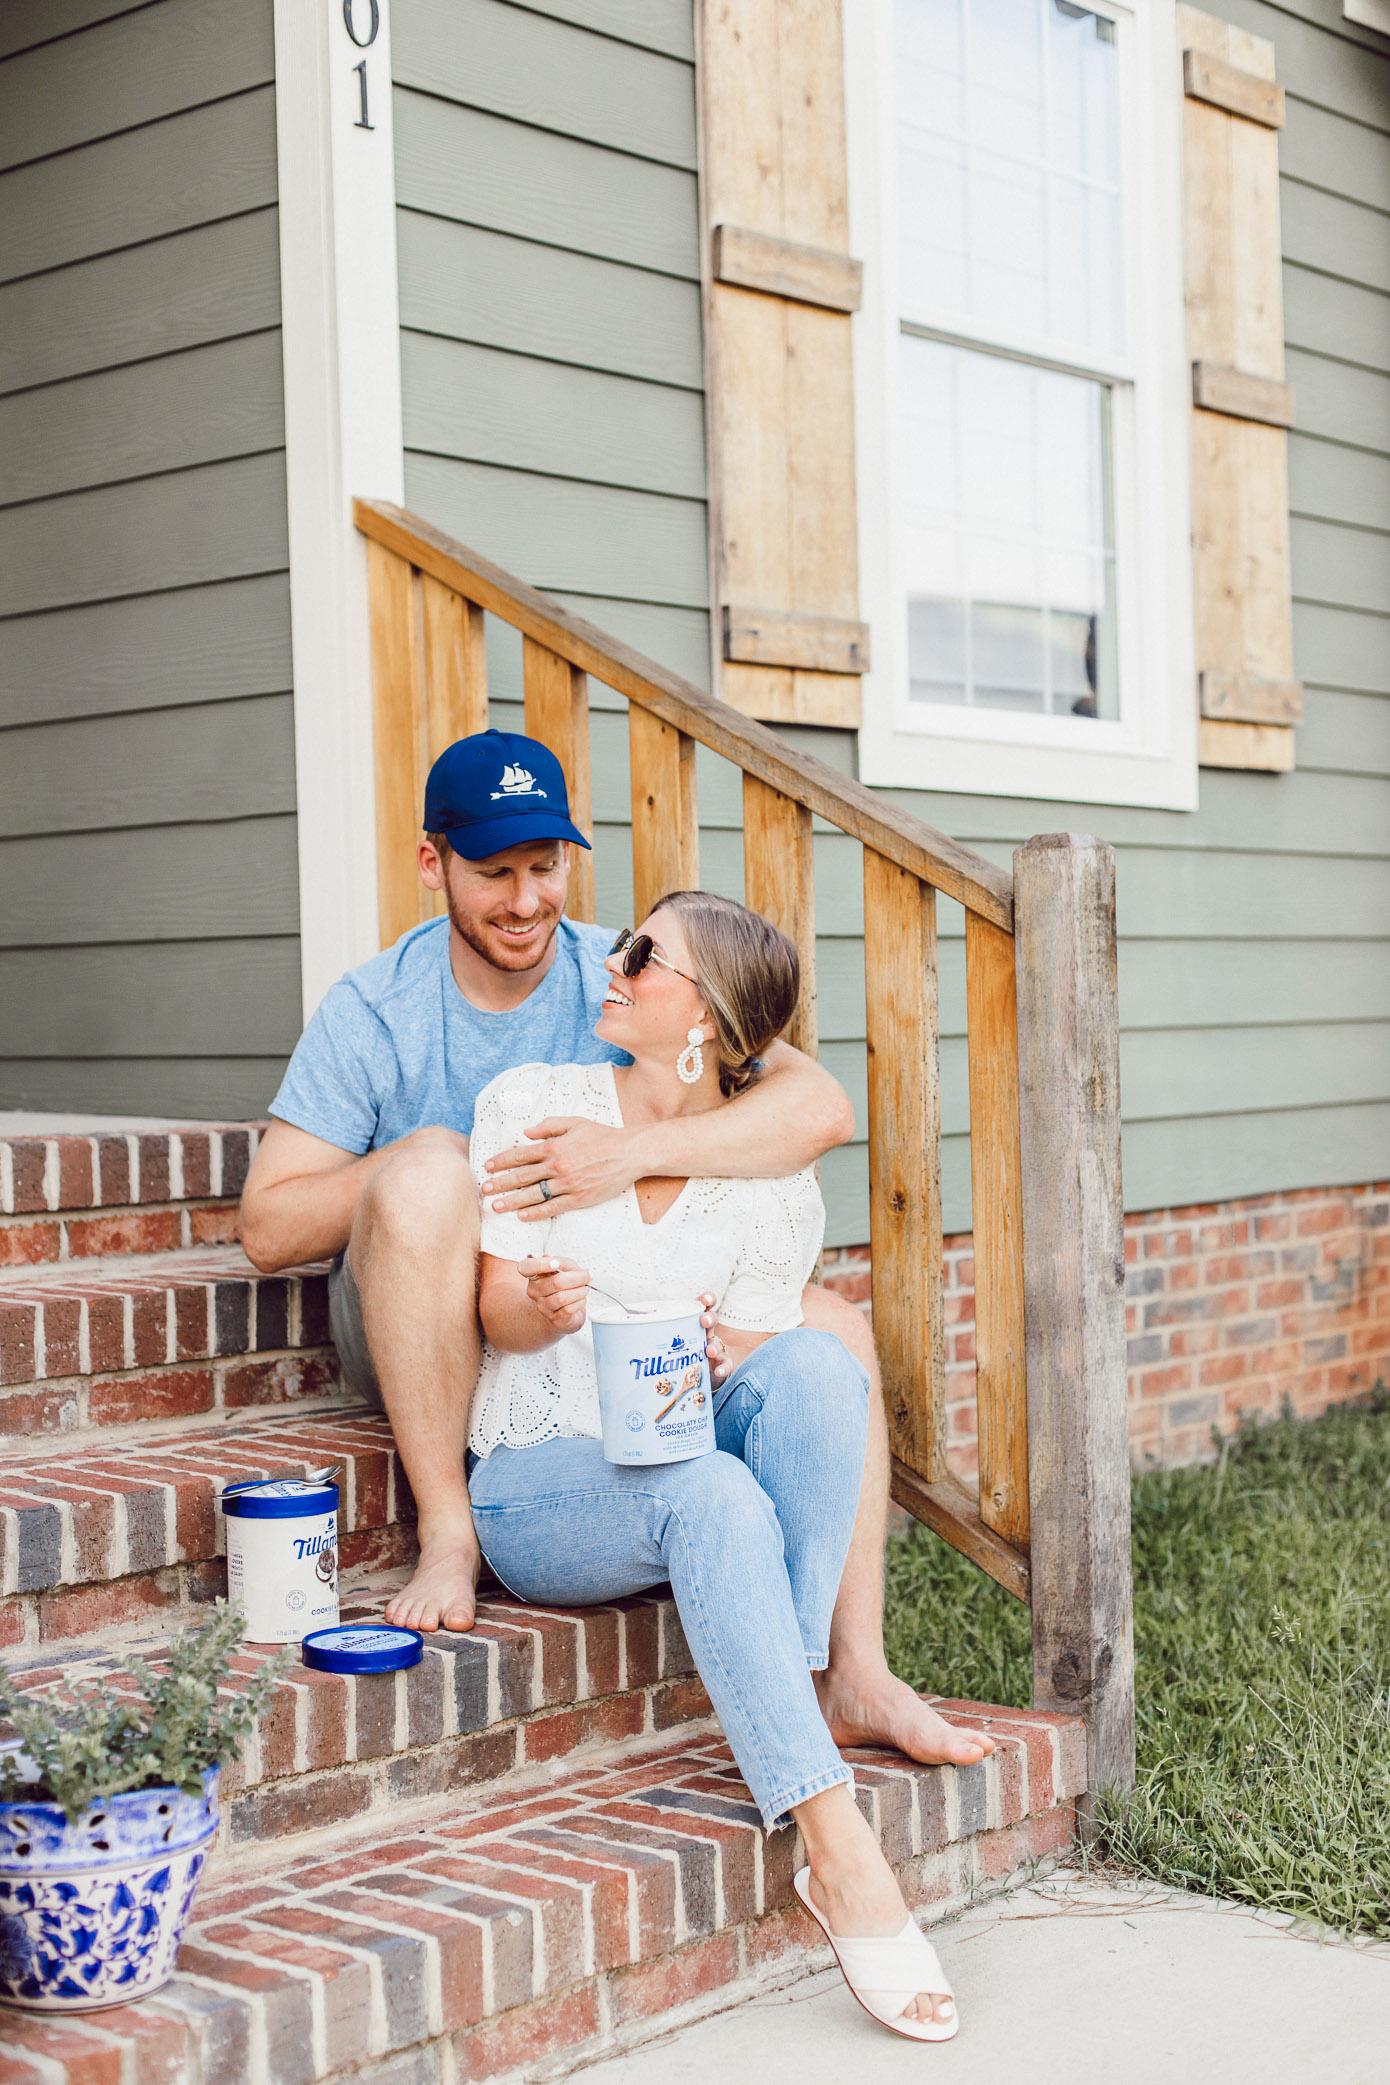 Tillamook Ice Cream in Charlotte | Louella Reese